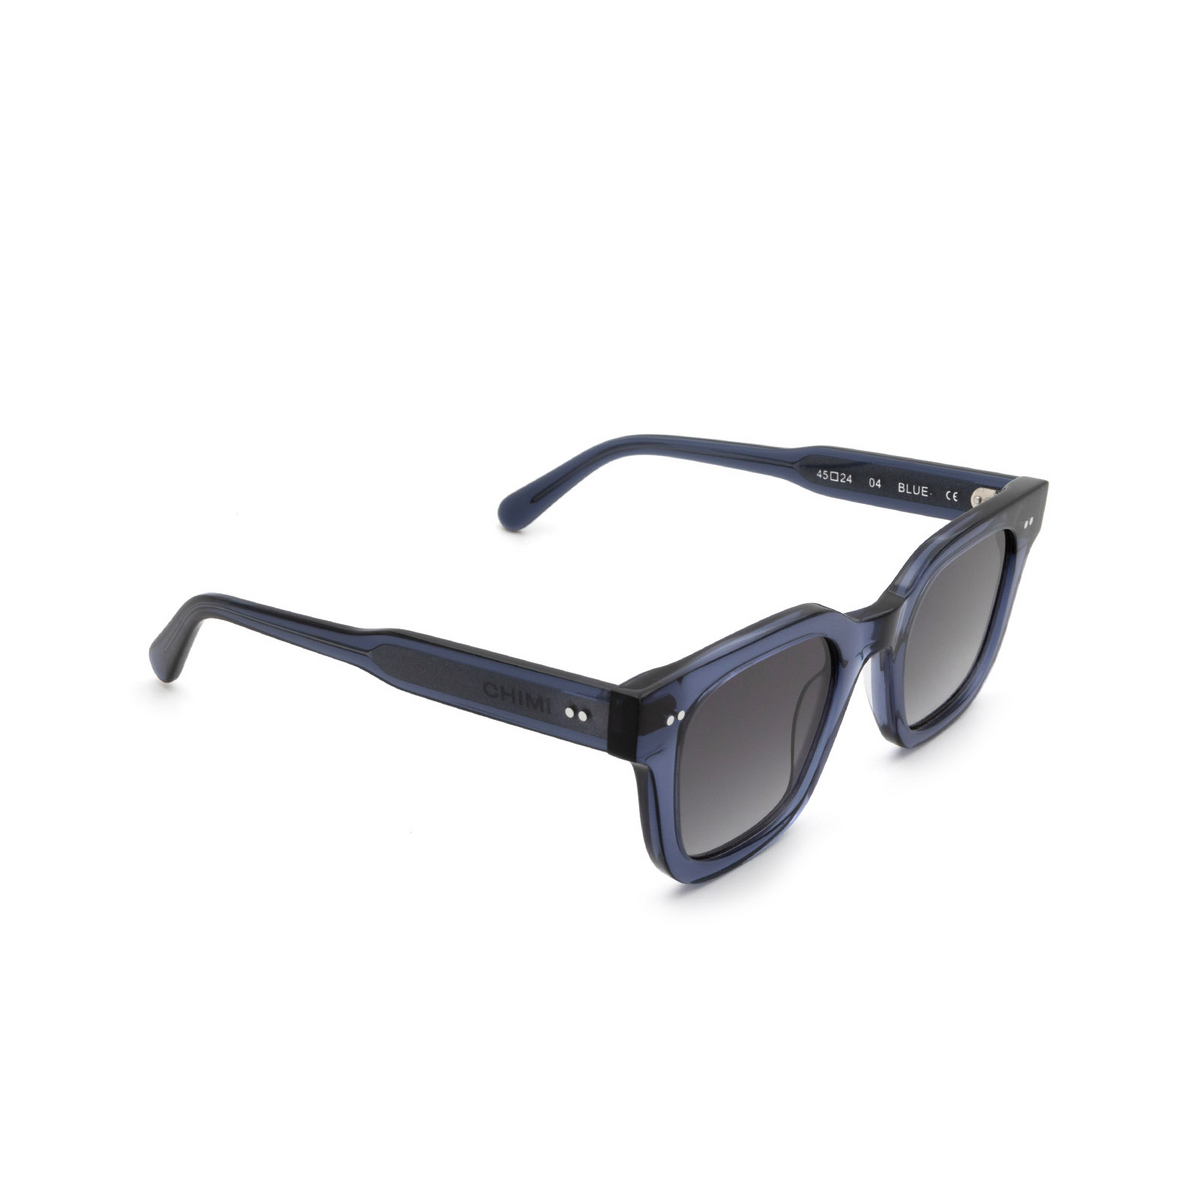 Chimi® Square Sunglasses: 04 color Blue - three-quarters view.